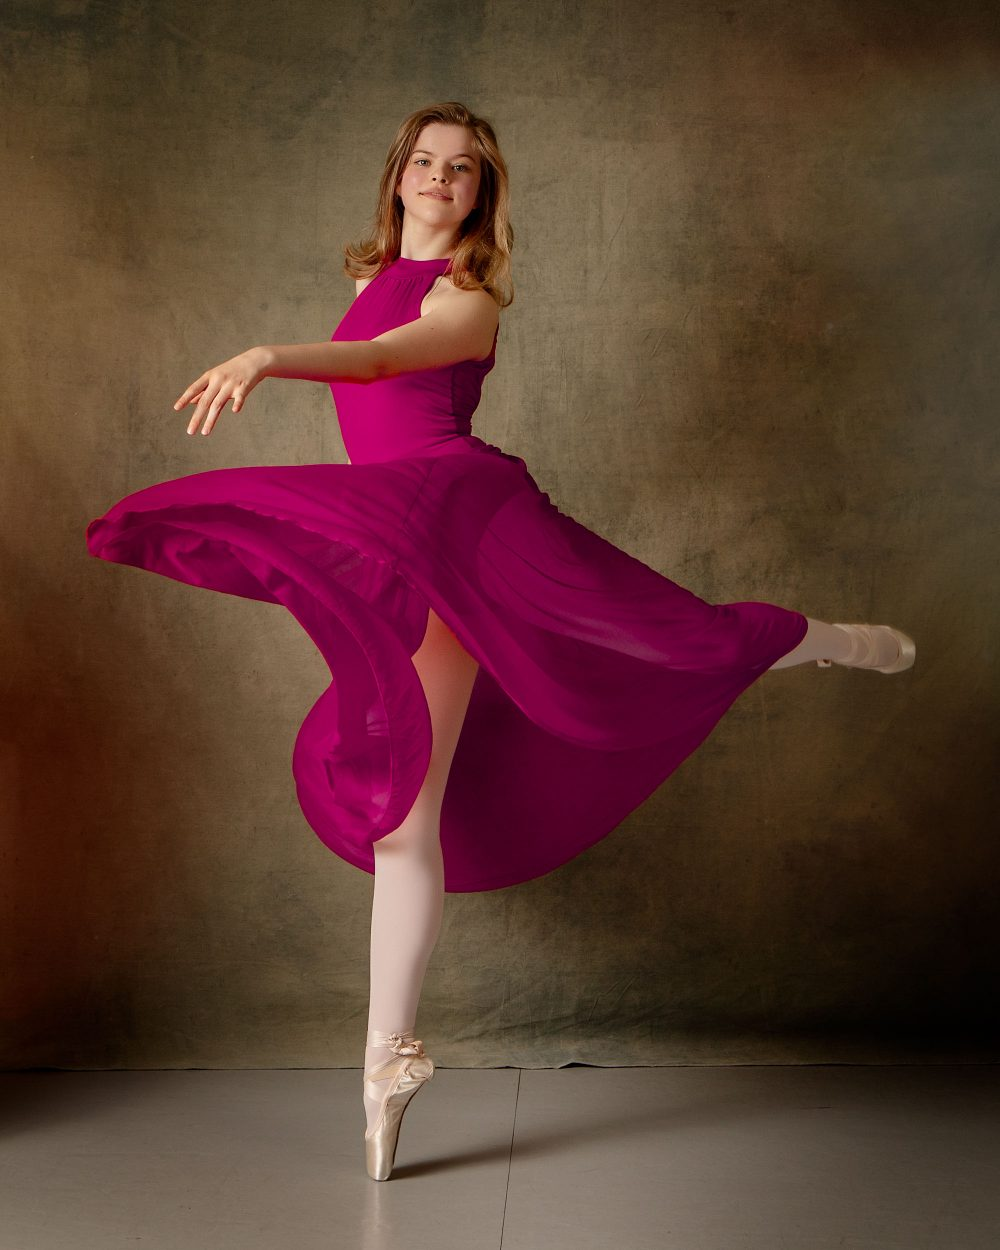 Ballerina, Dance portrait